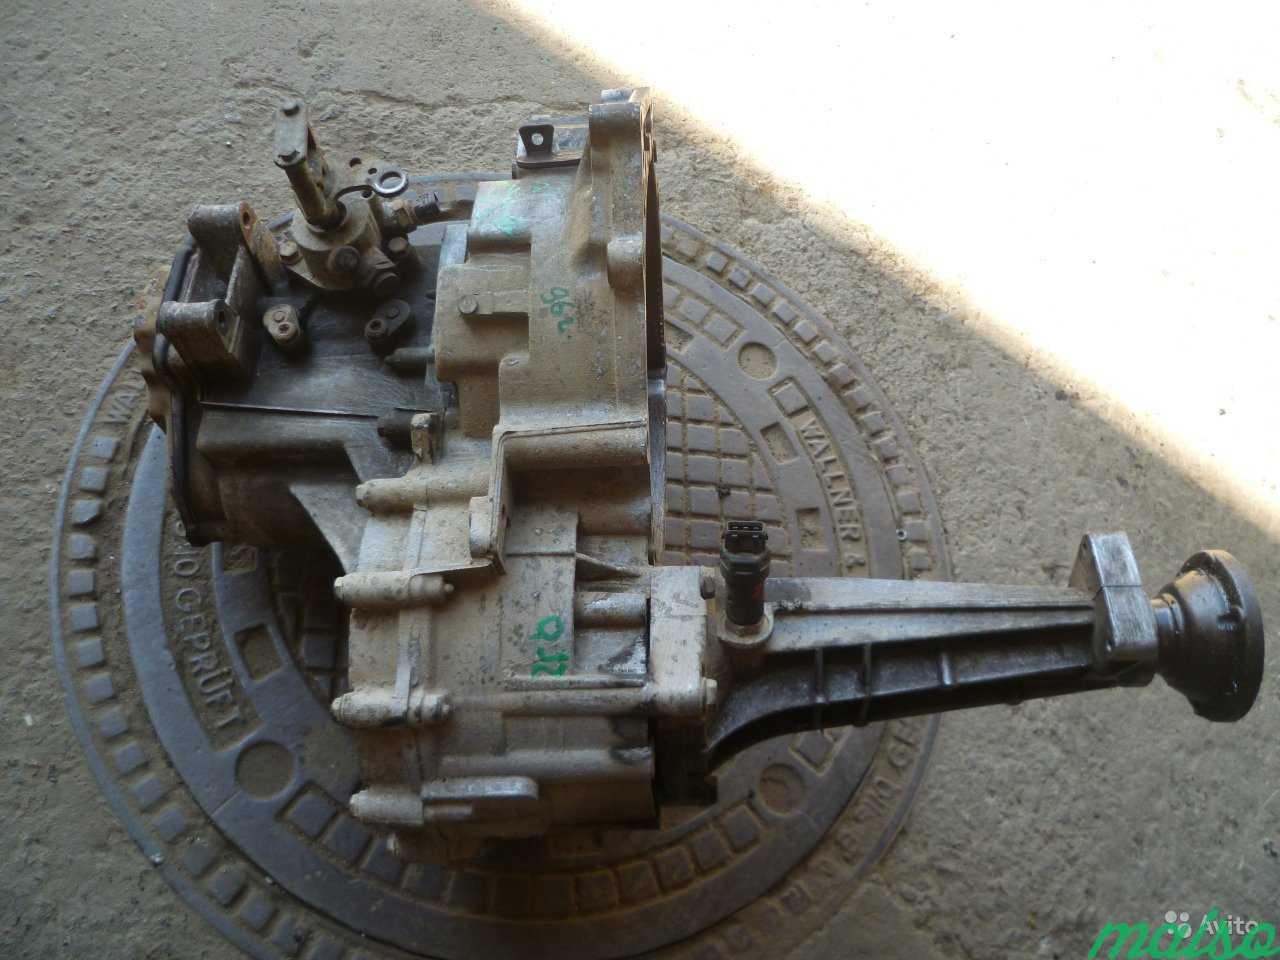 Куплю кпп фольксваген транспортер характеристика транспортера тсн 160